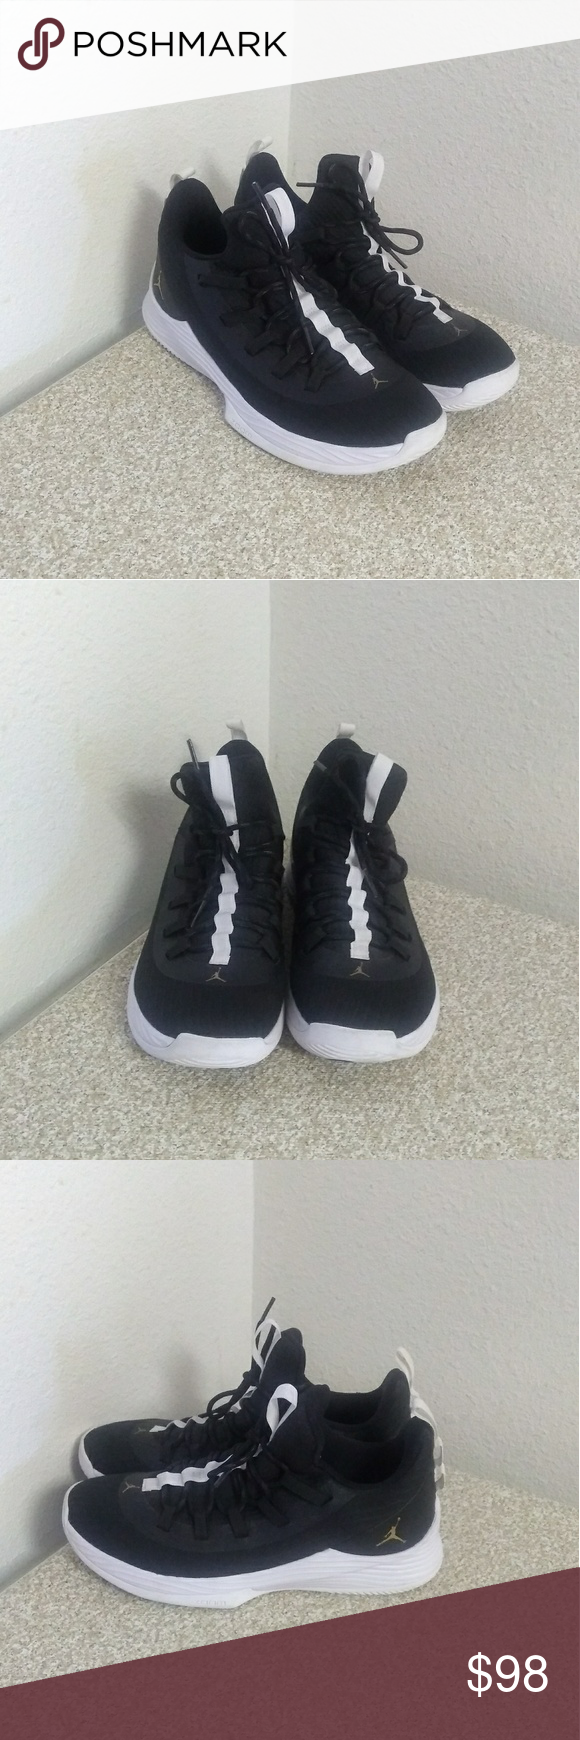 reputable site 2ab5c fd9fa Jordan Shoes   Air Jordan Ultra Fly 2 Basketball Sneakers ...